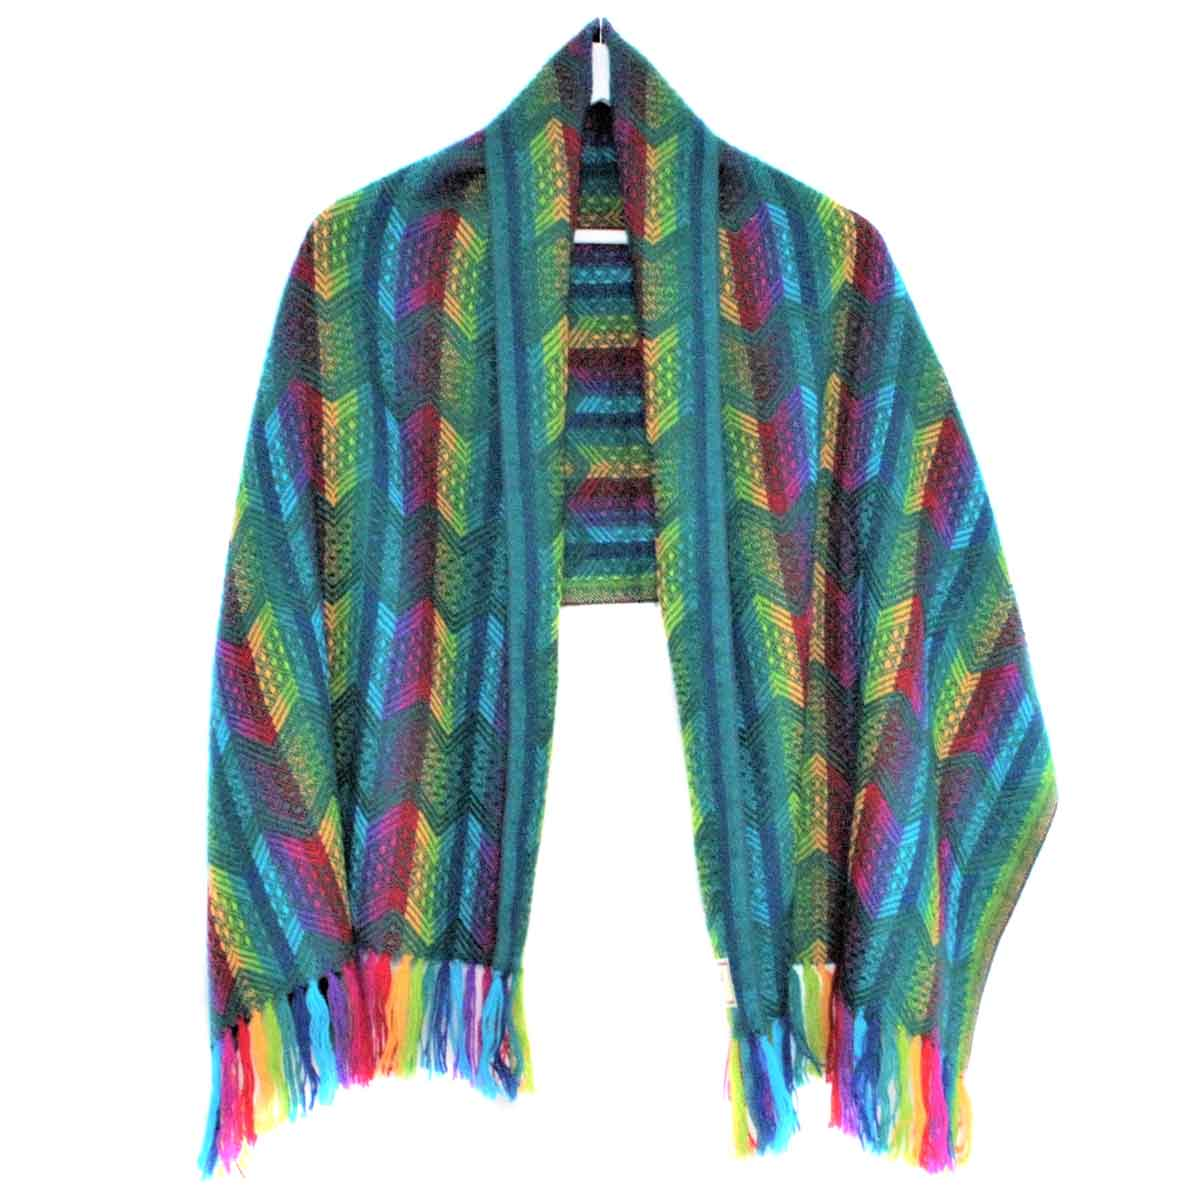 Inka-Products-Châle SAYTU-Vert motifs ethniques-2